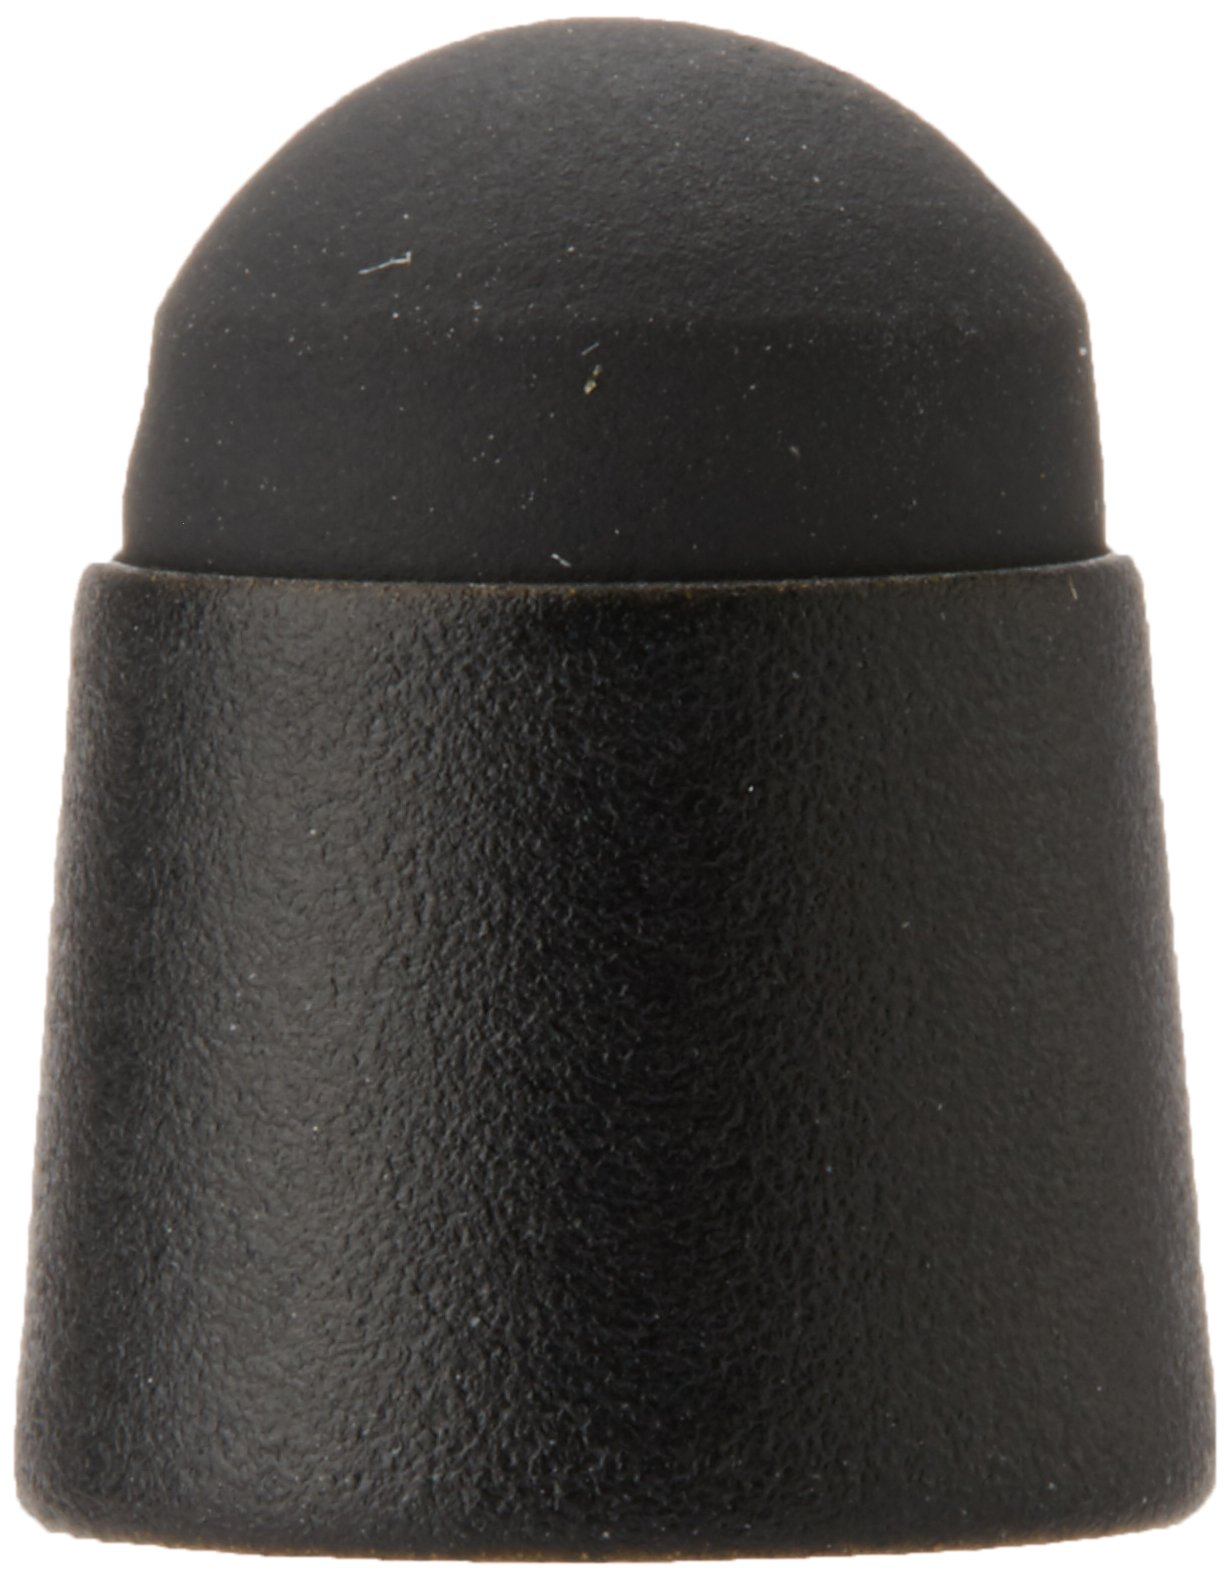 Cross Tech3+ Stylus Replacement Attachment, Satin Black (9020S-3)